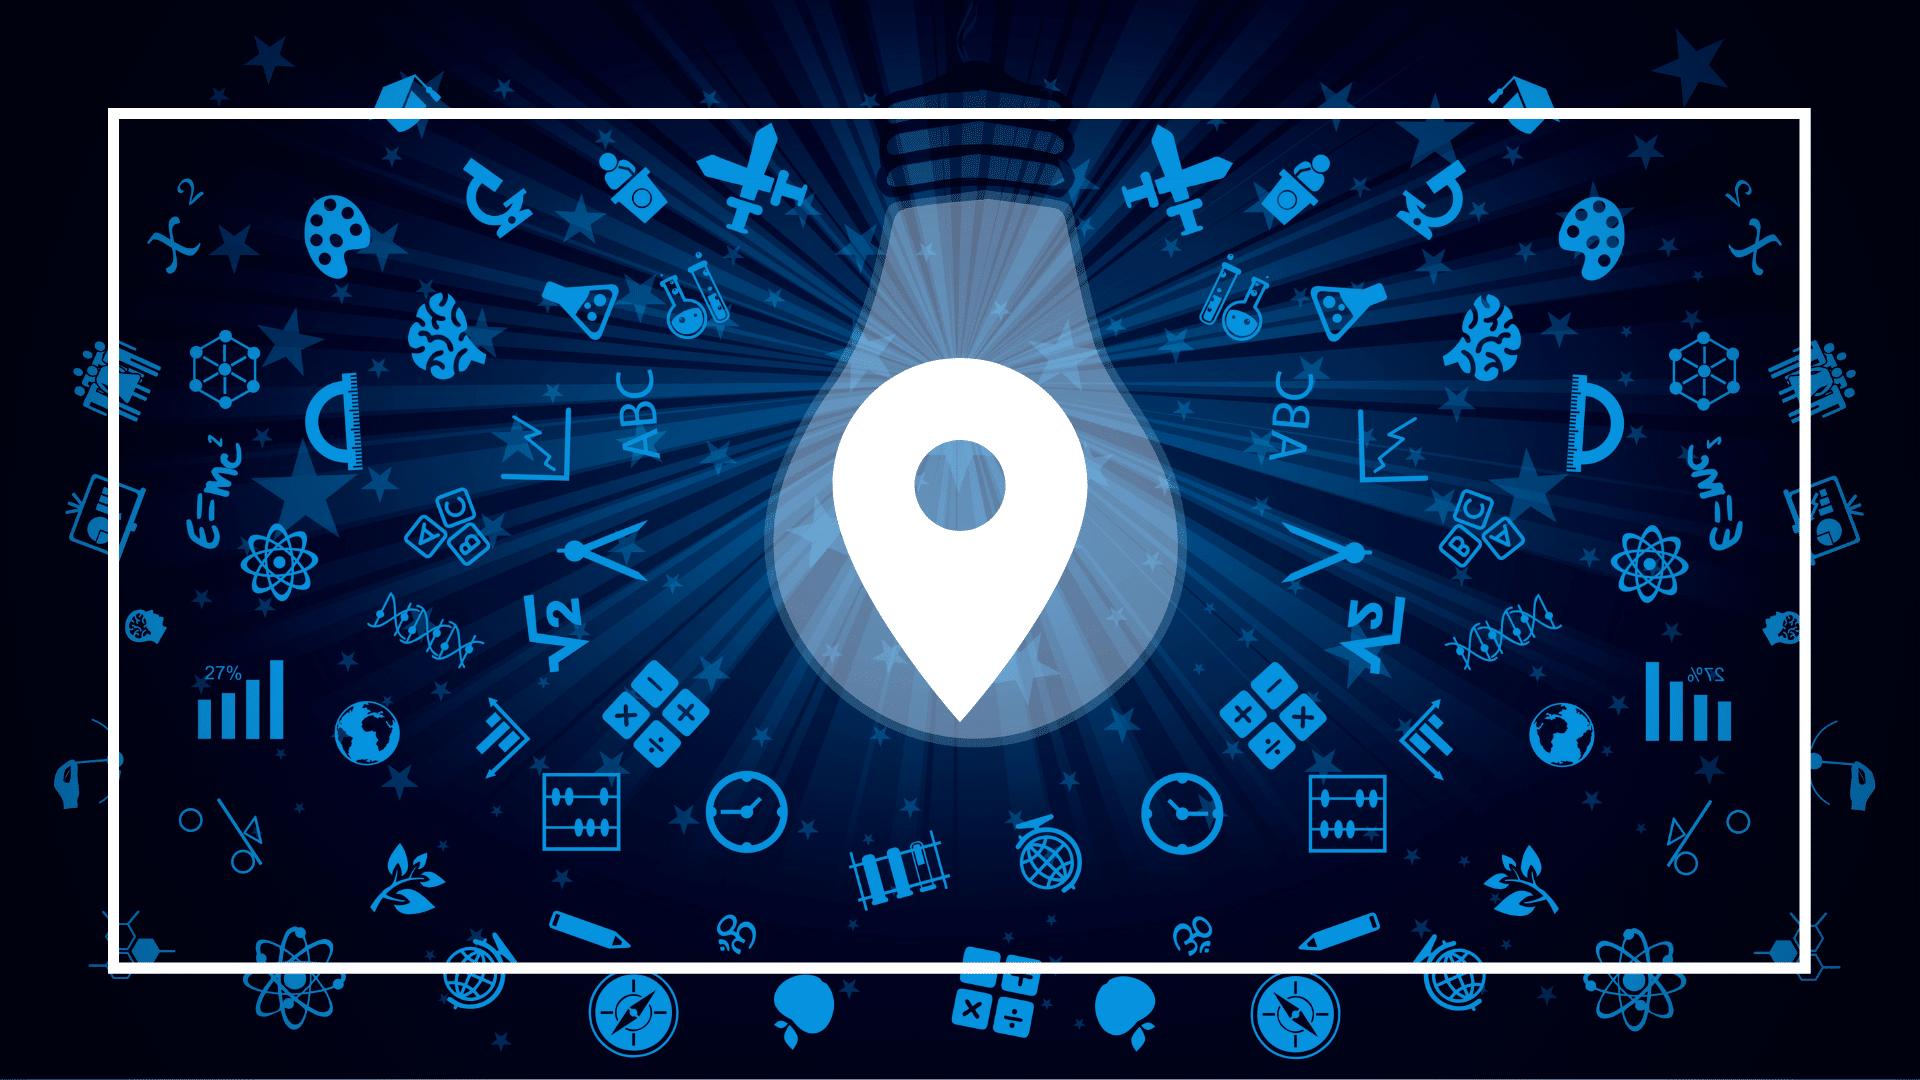 localization-icon-app-background